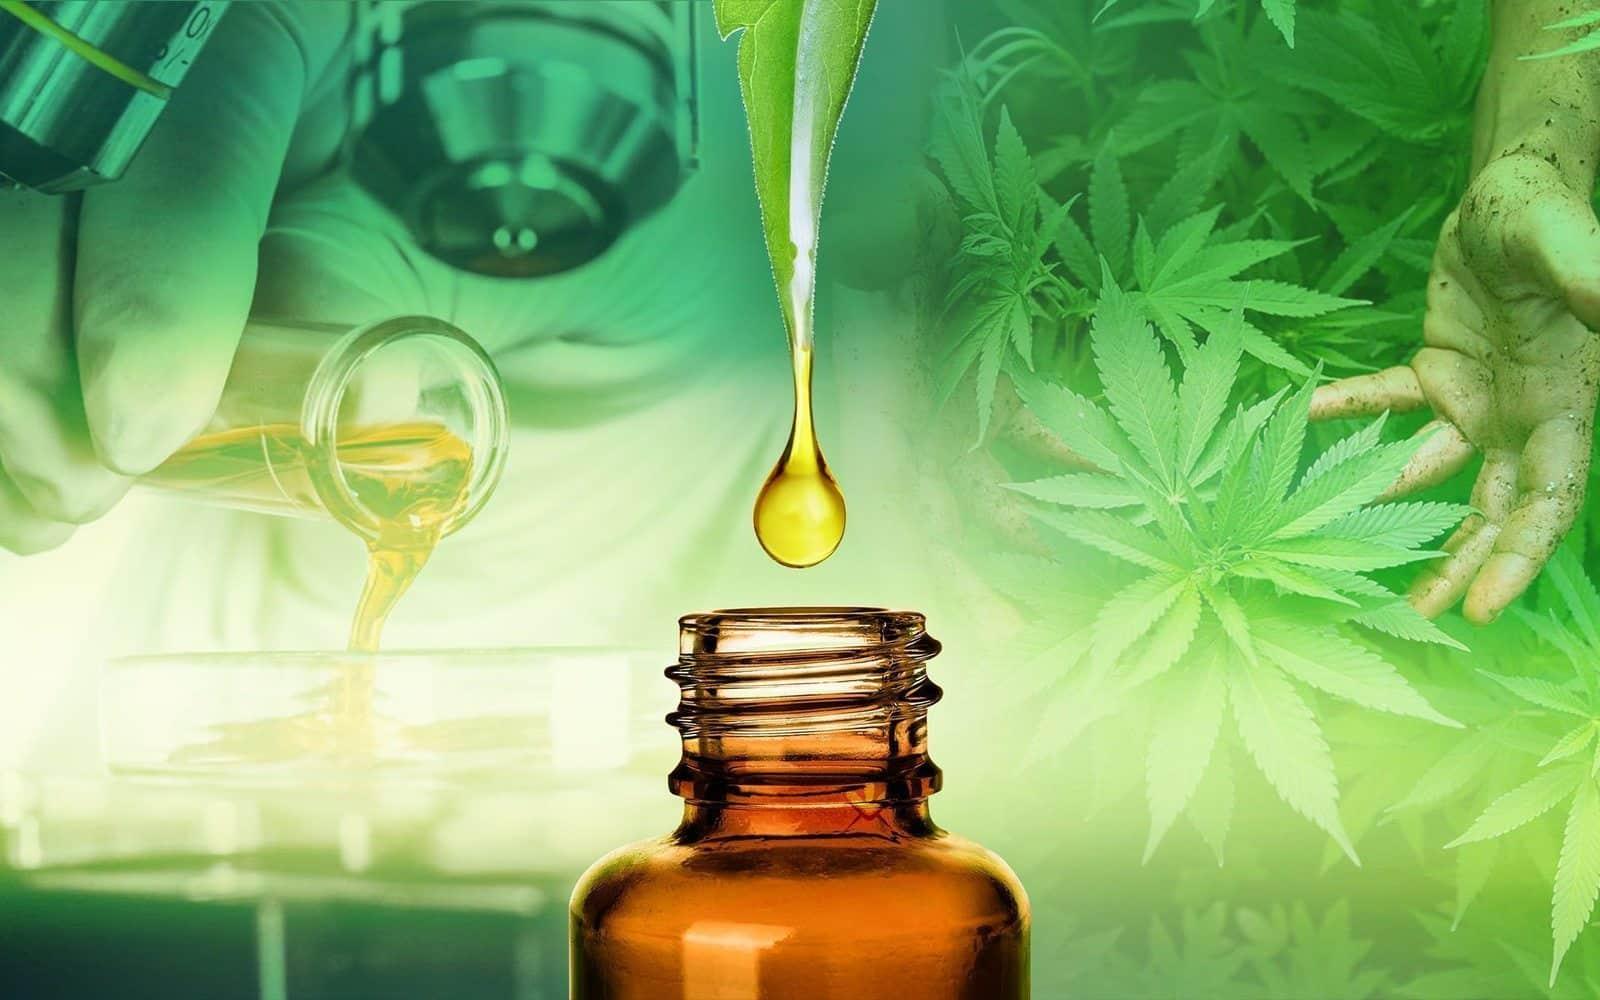 5 Little Known Health Benefits Of CBD Oil